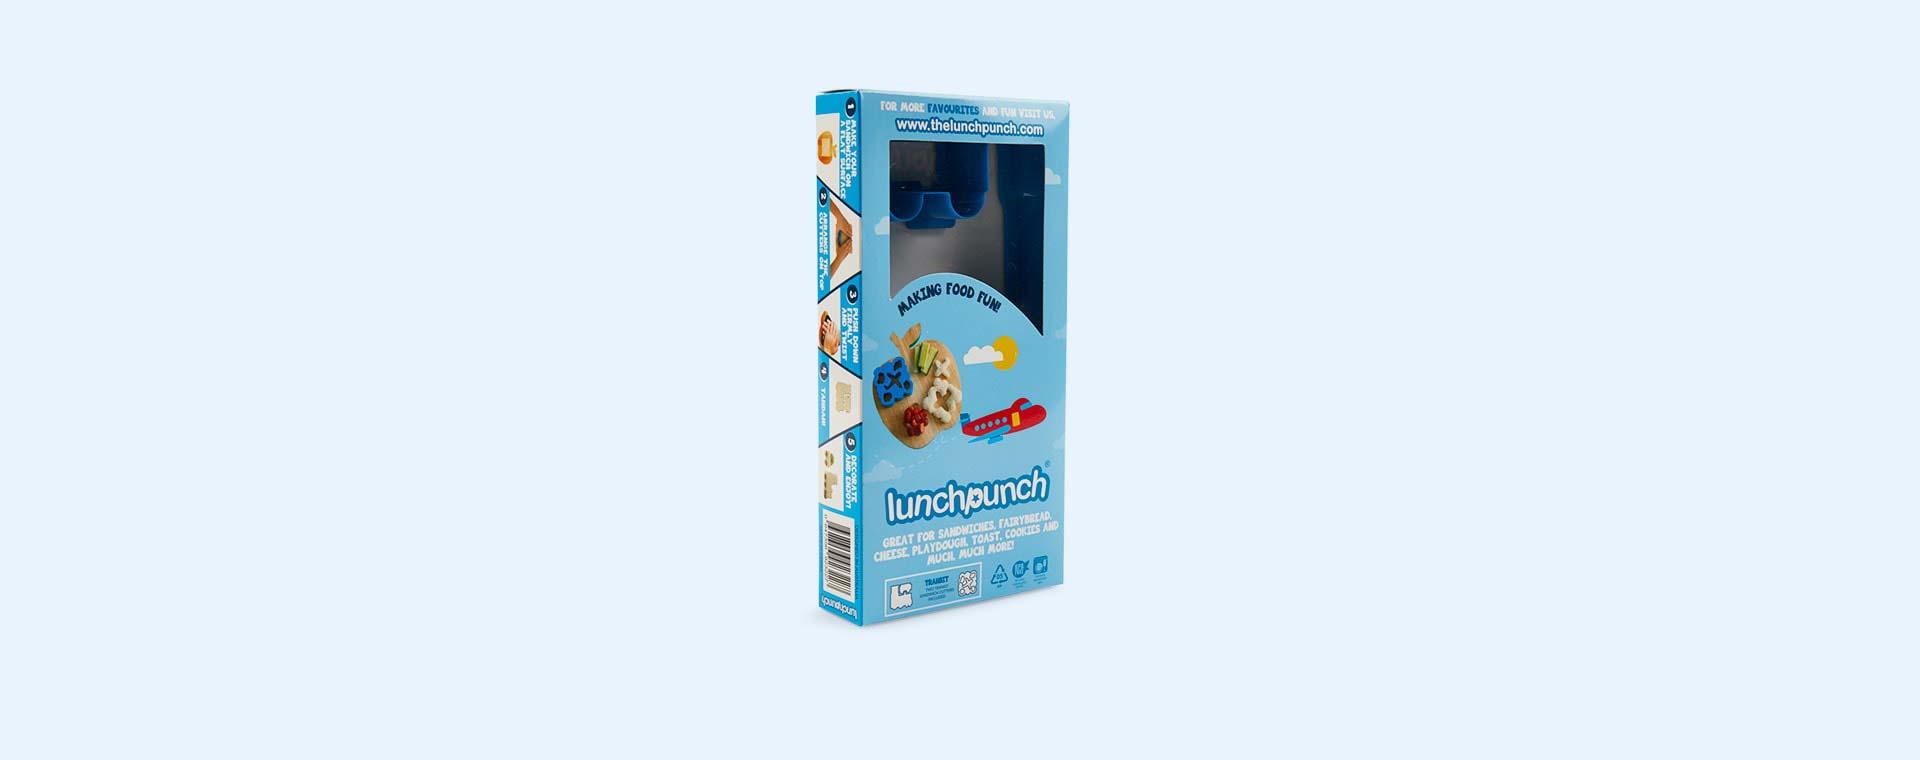 Transit Lunch Punch Sandwich Cutters